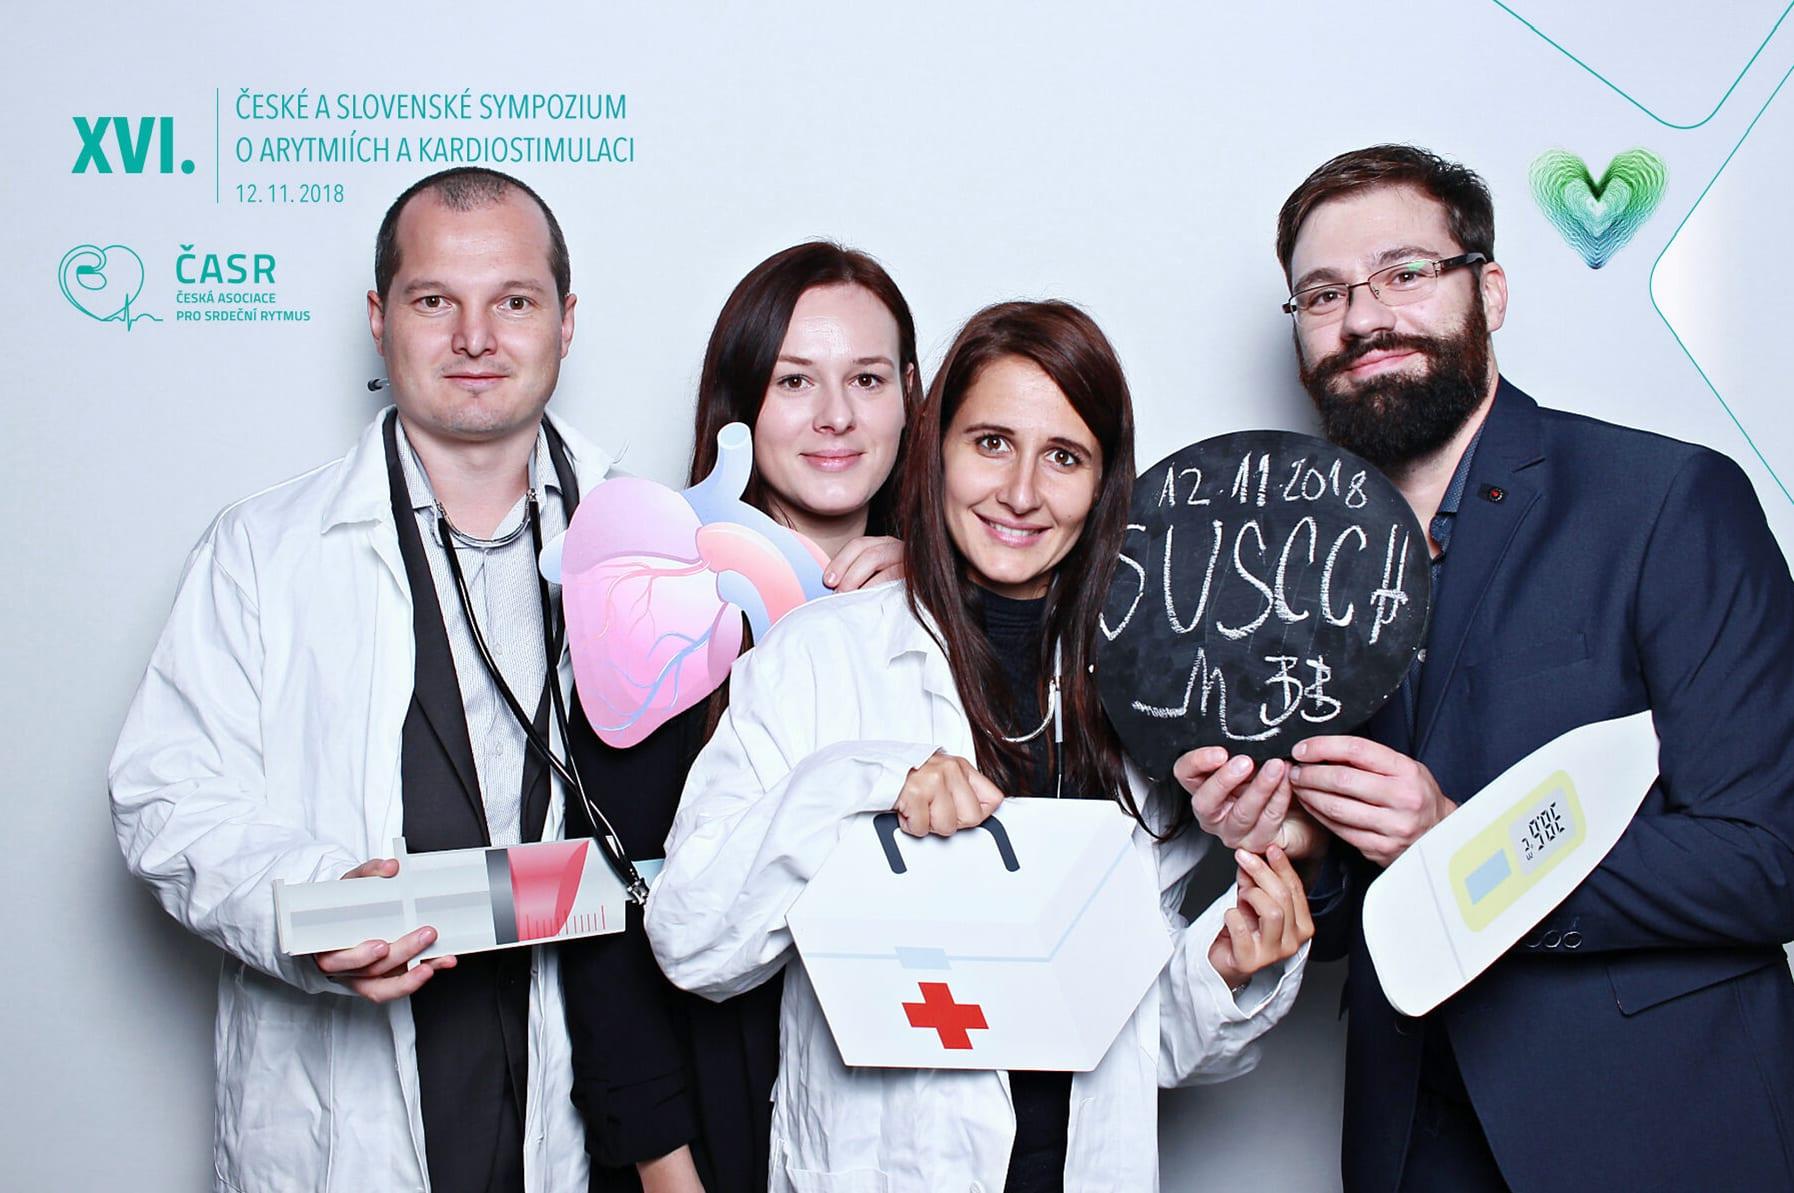 fotokoutek-casr-xvi-ceske-a-slovenske-sympozium-o-arytmiich-a-kardiostimulaci-12-11-2018-520544